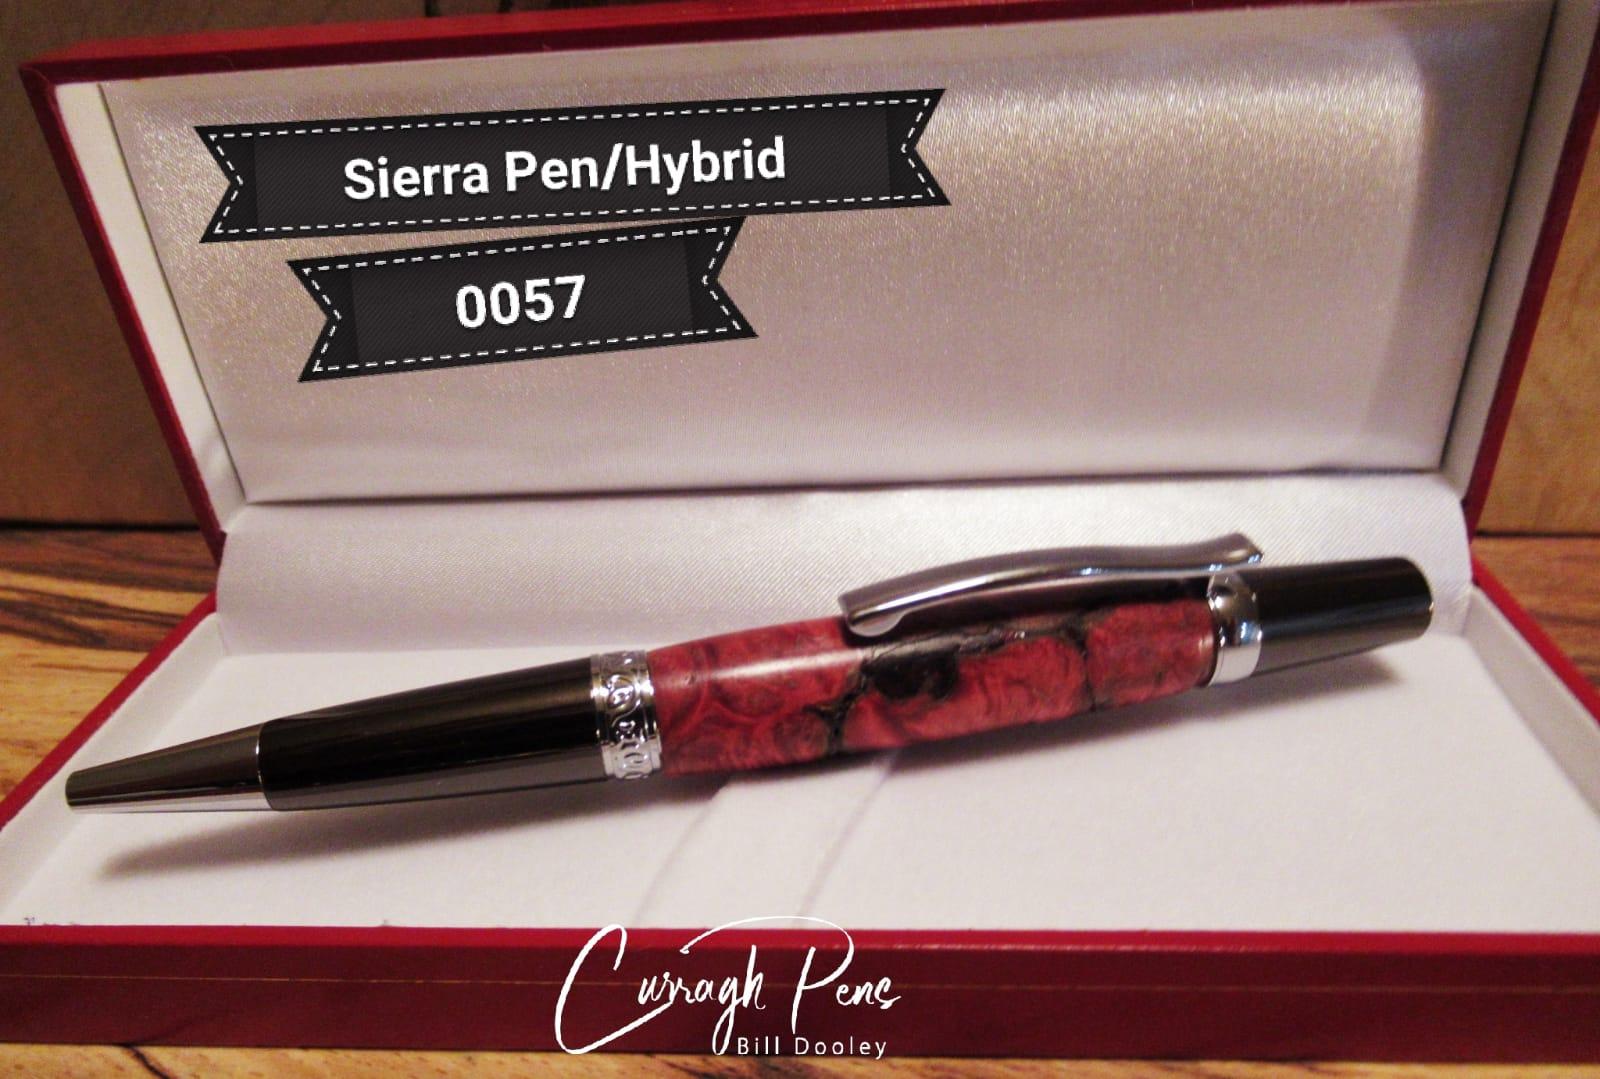 Sierra Pen Hybrid 0057